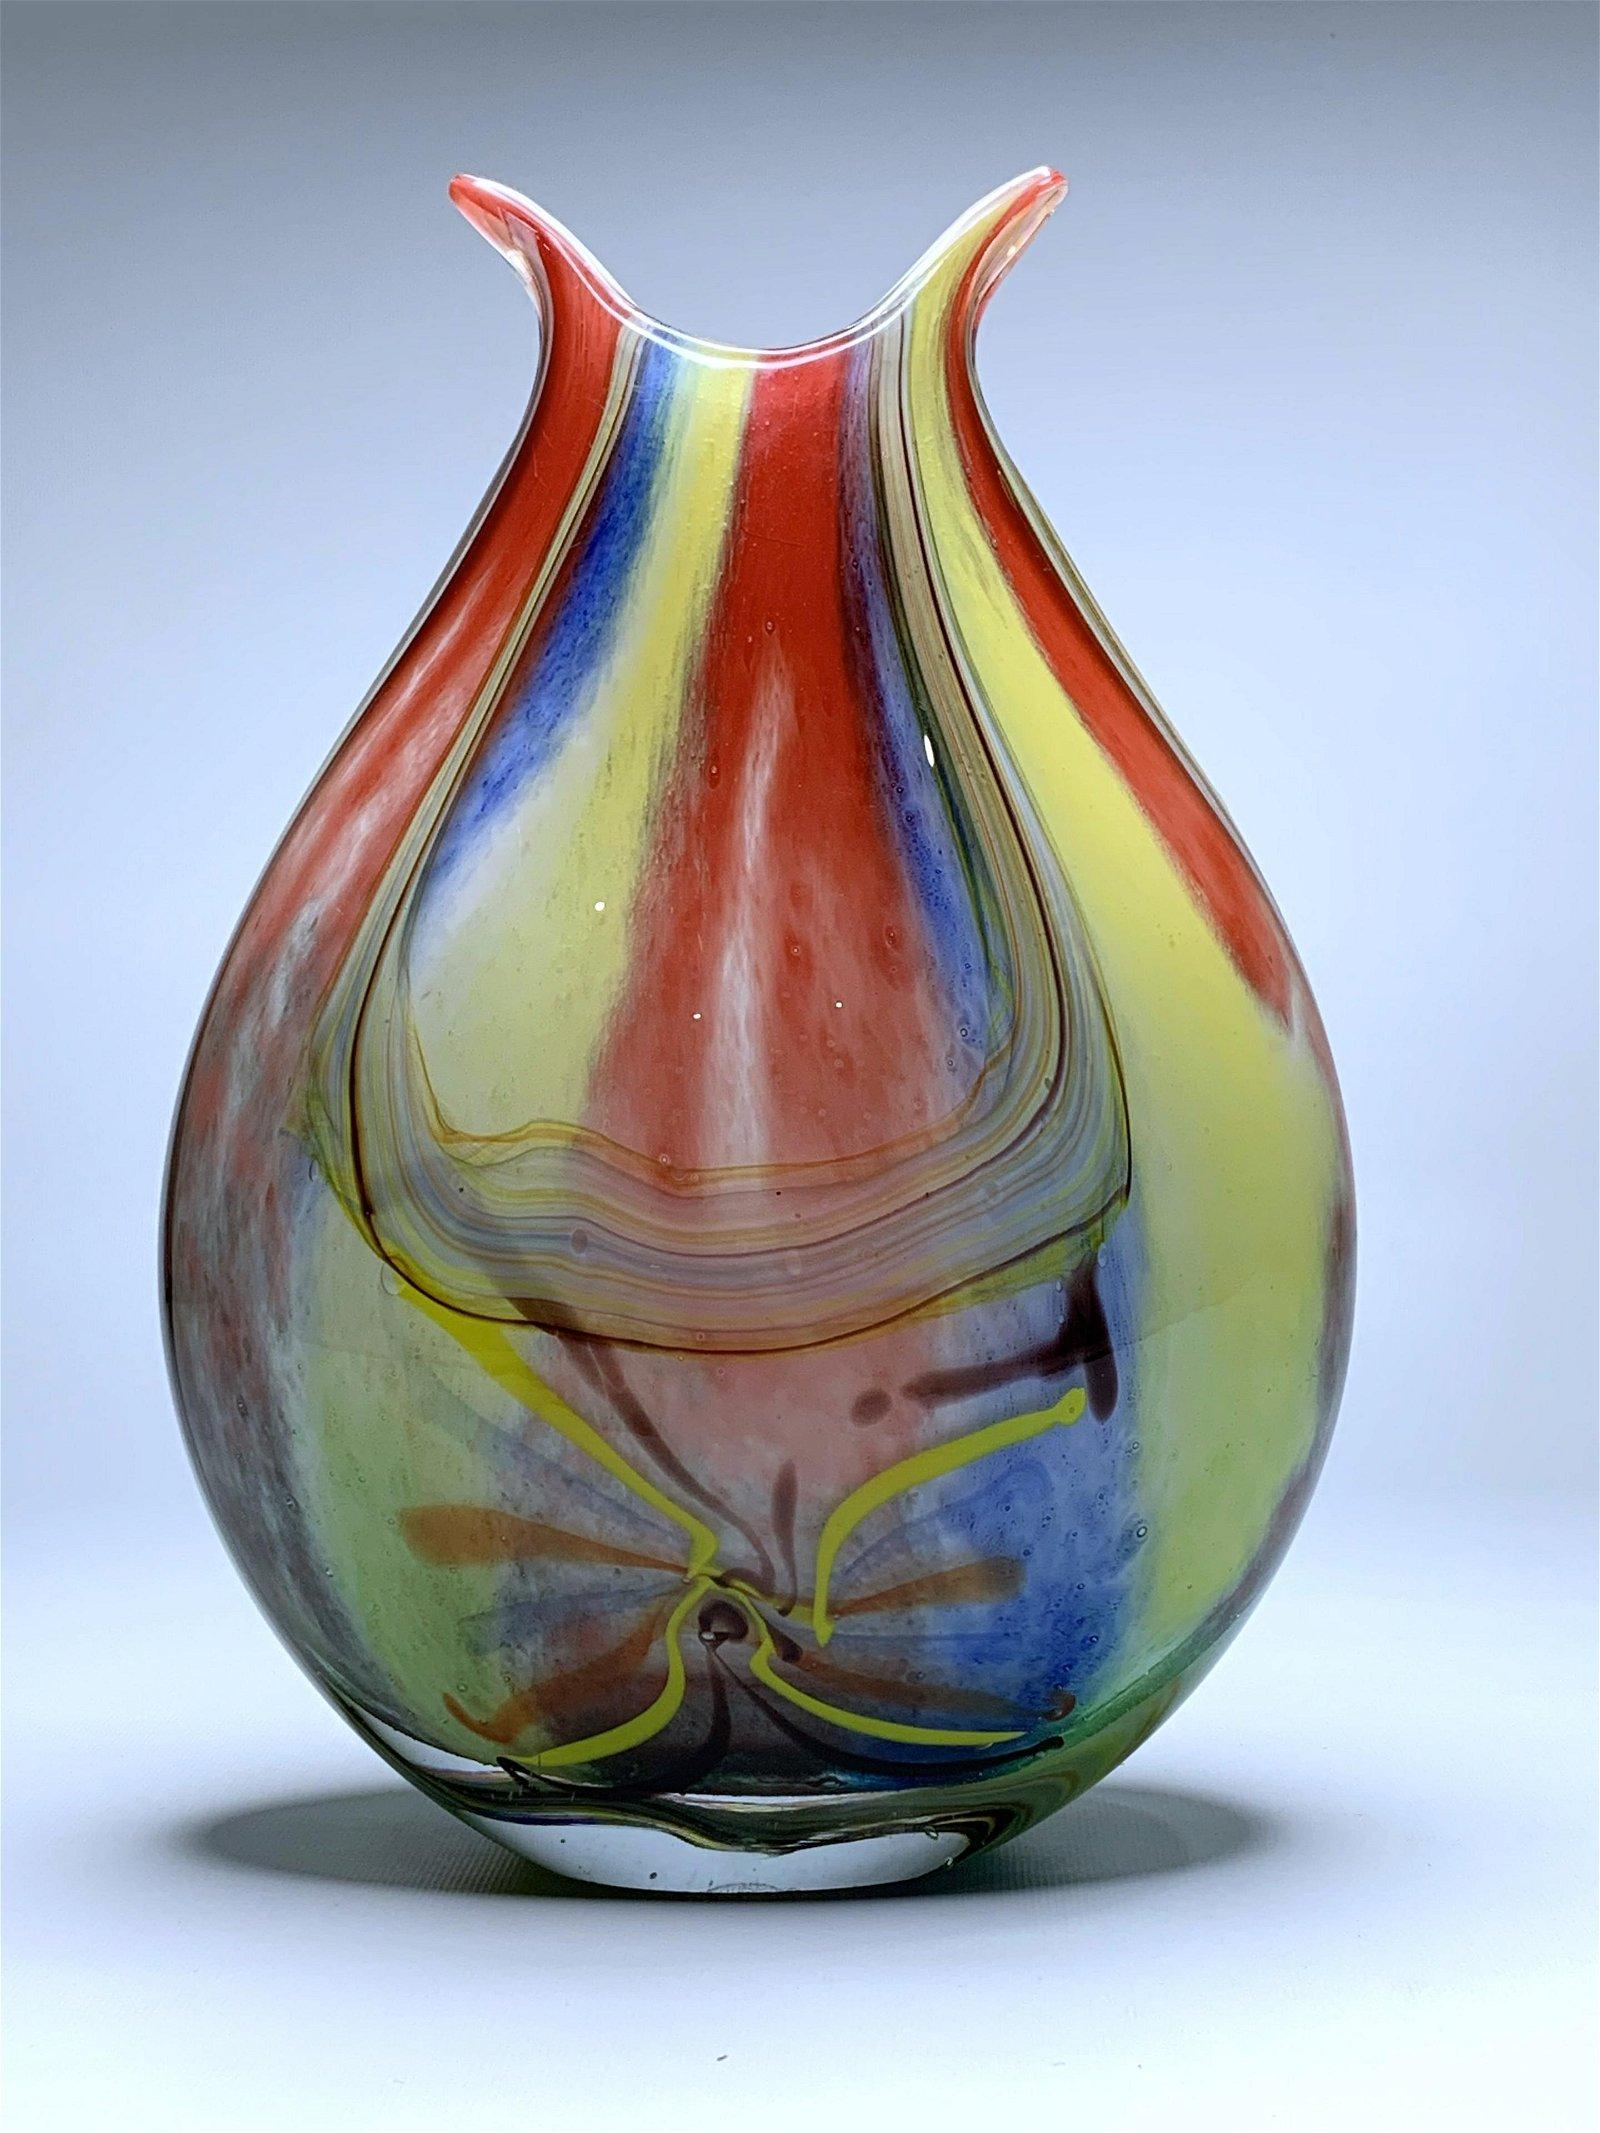 BEAUTIFUL VINTAGE MURANO ART GLASS VASE